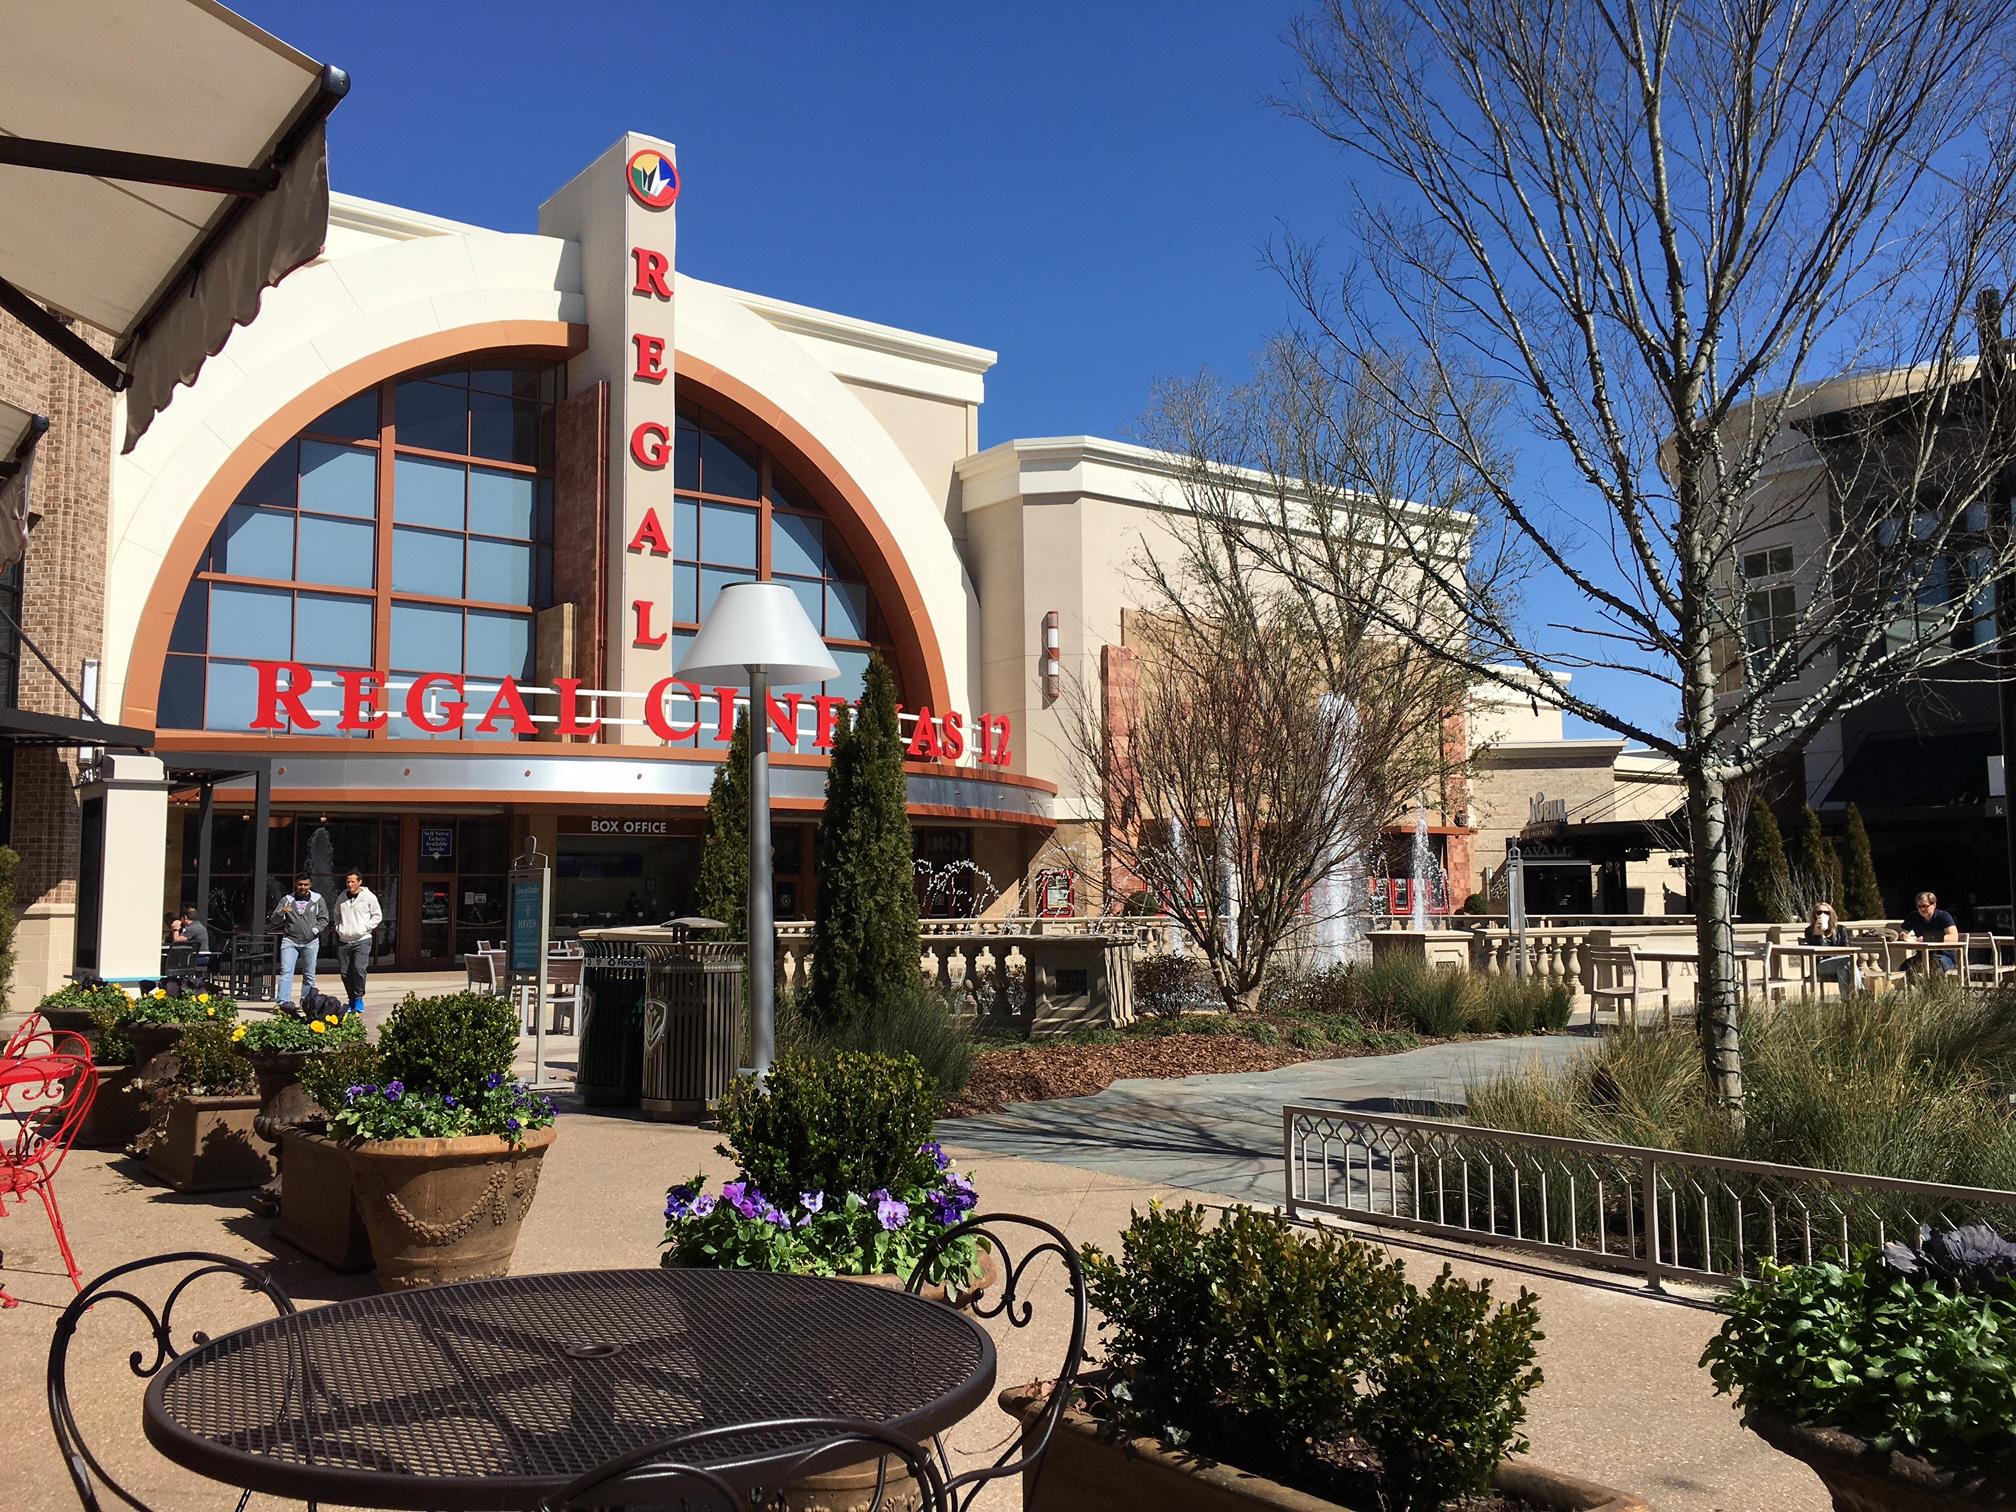 Regal Avalon 12 >> Regal Cinemas Avalon 12 3950 1st St Alpharetta Ga 30009